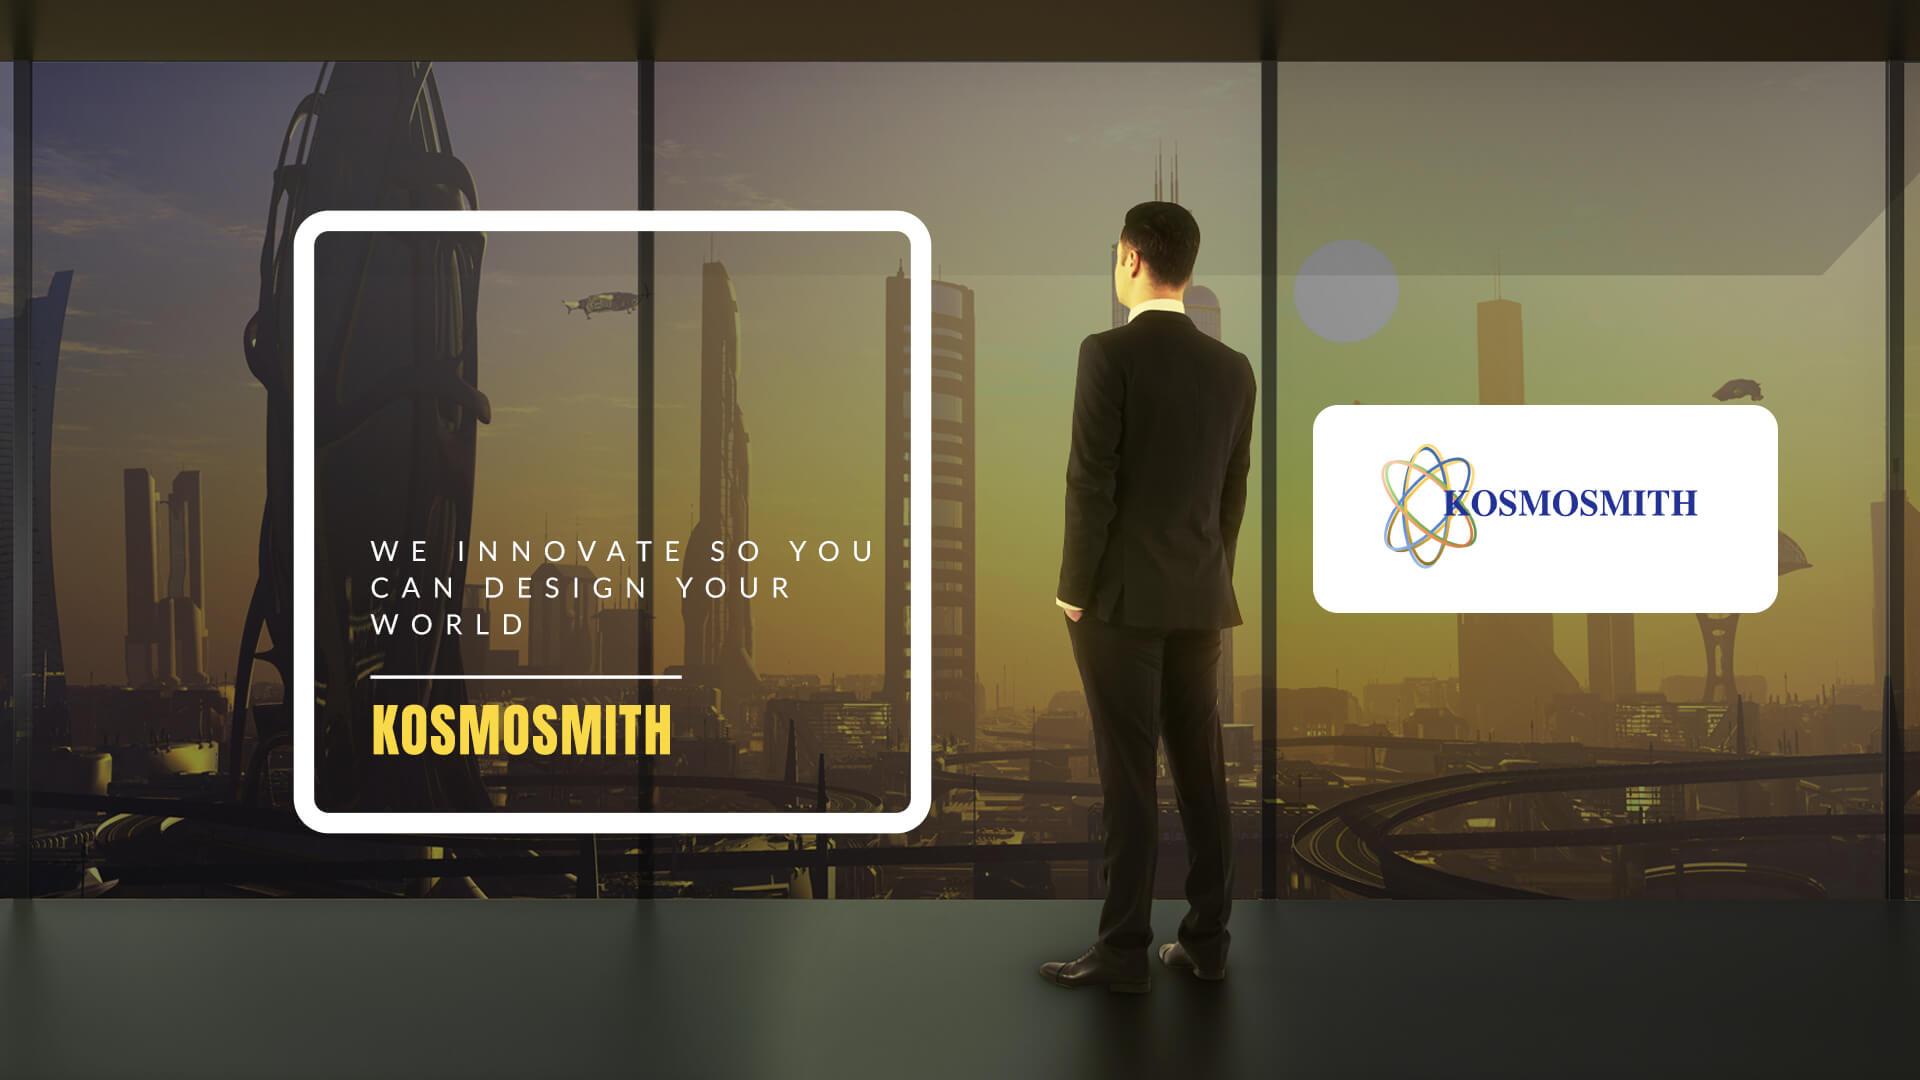 Kosmosmith